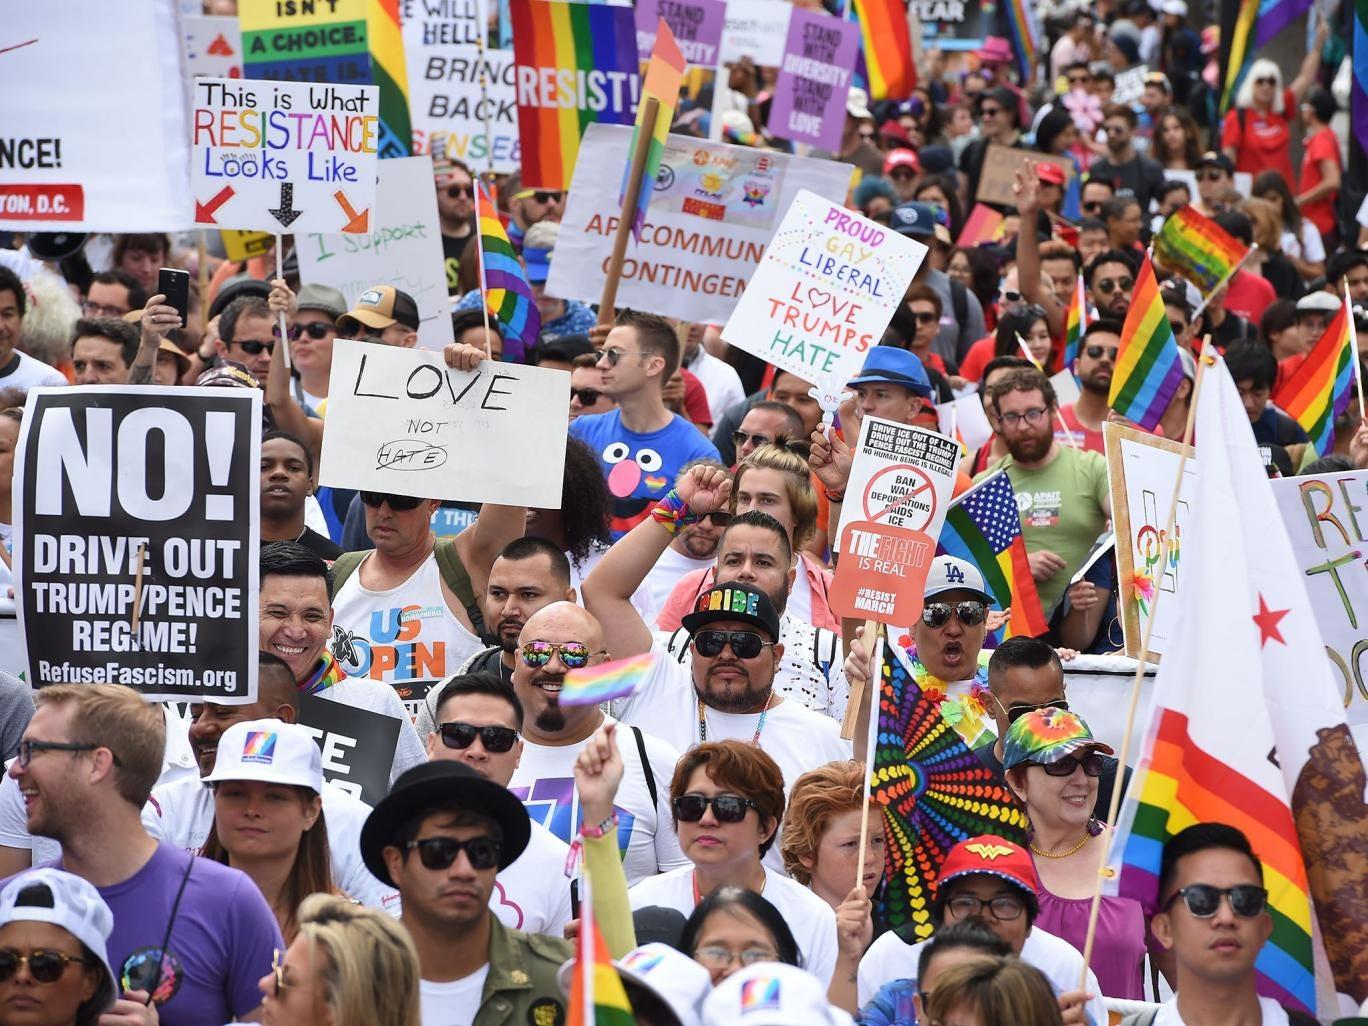 Long Island LGBT Senior Center Threatened with Violence